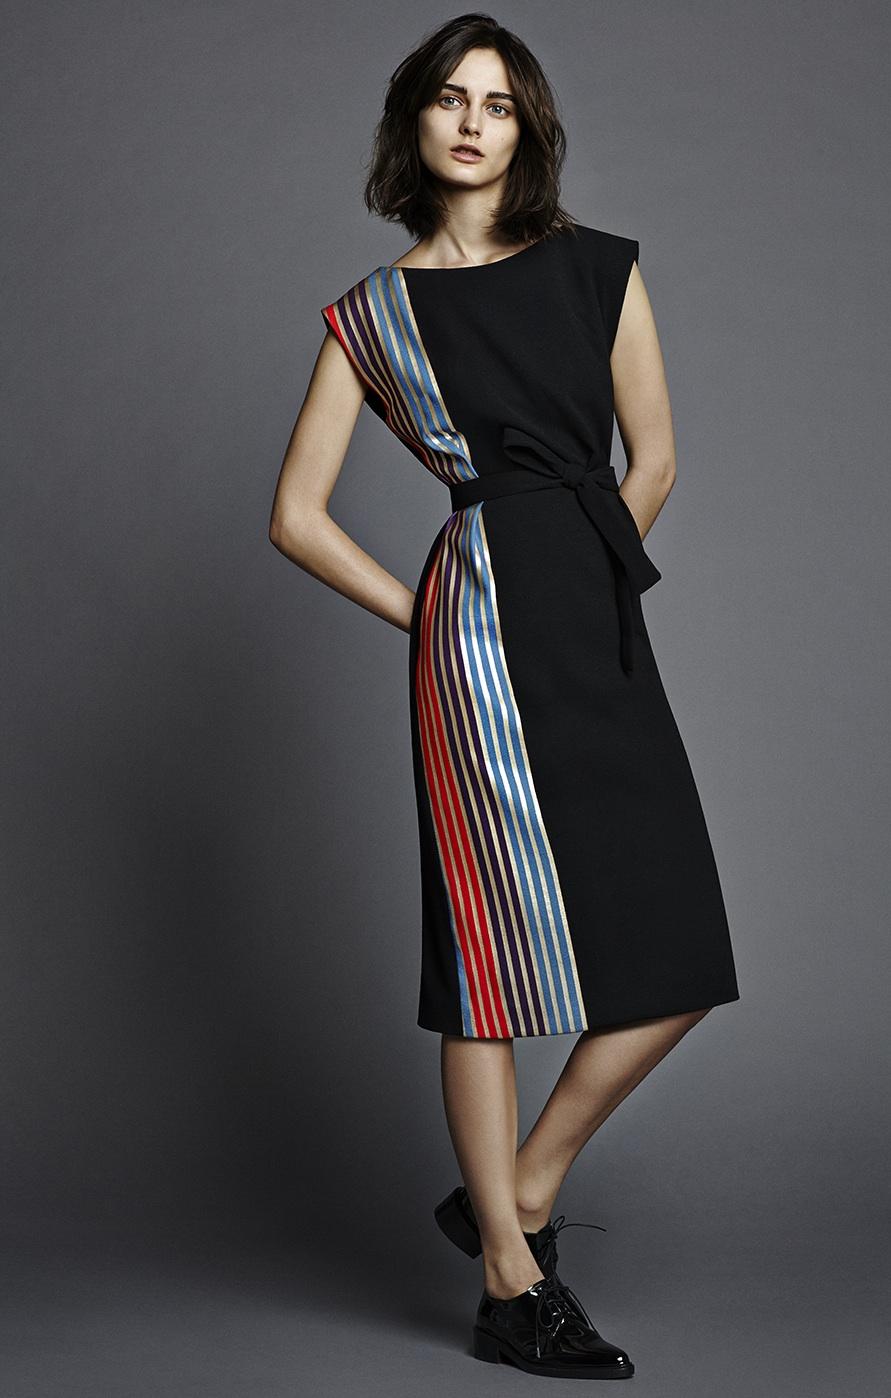 MODEL_Osman_Amazon_dress_fulllength_alta